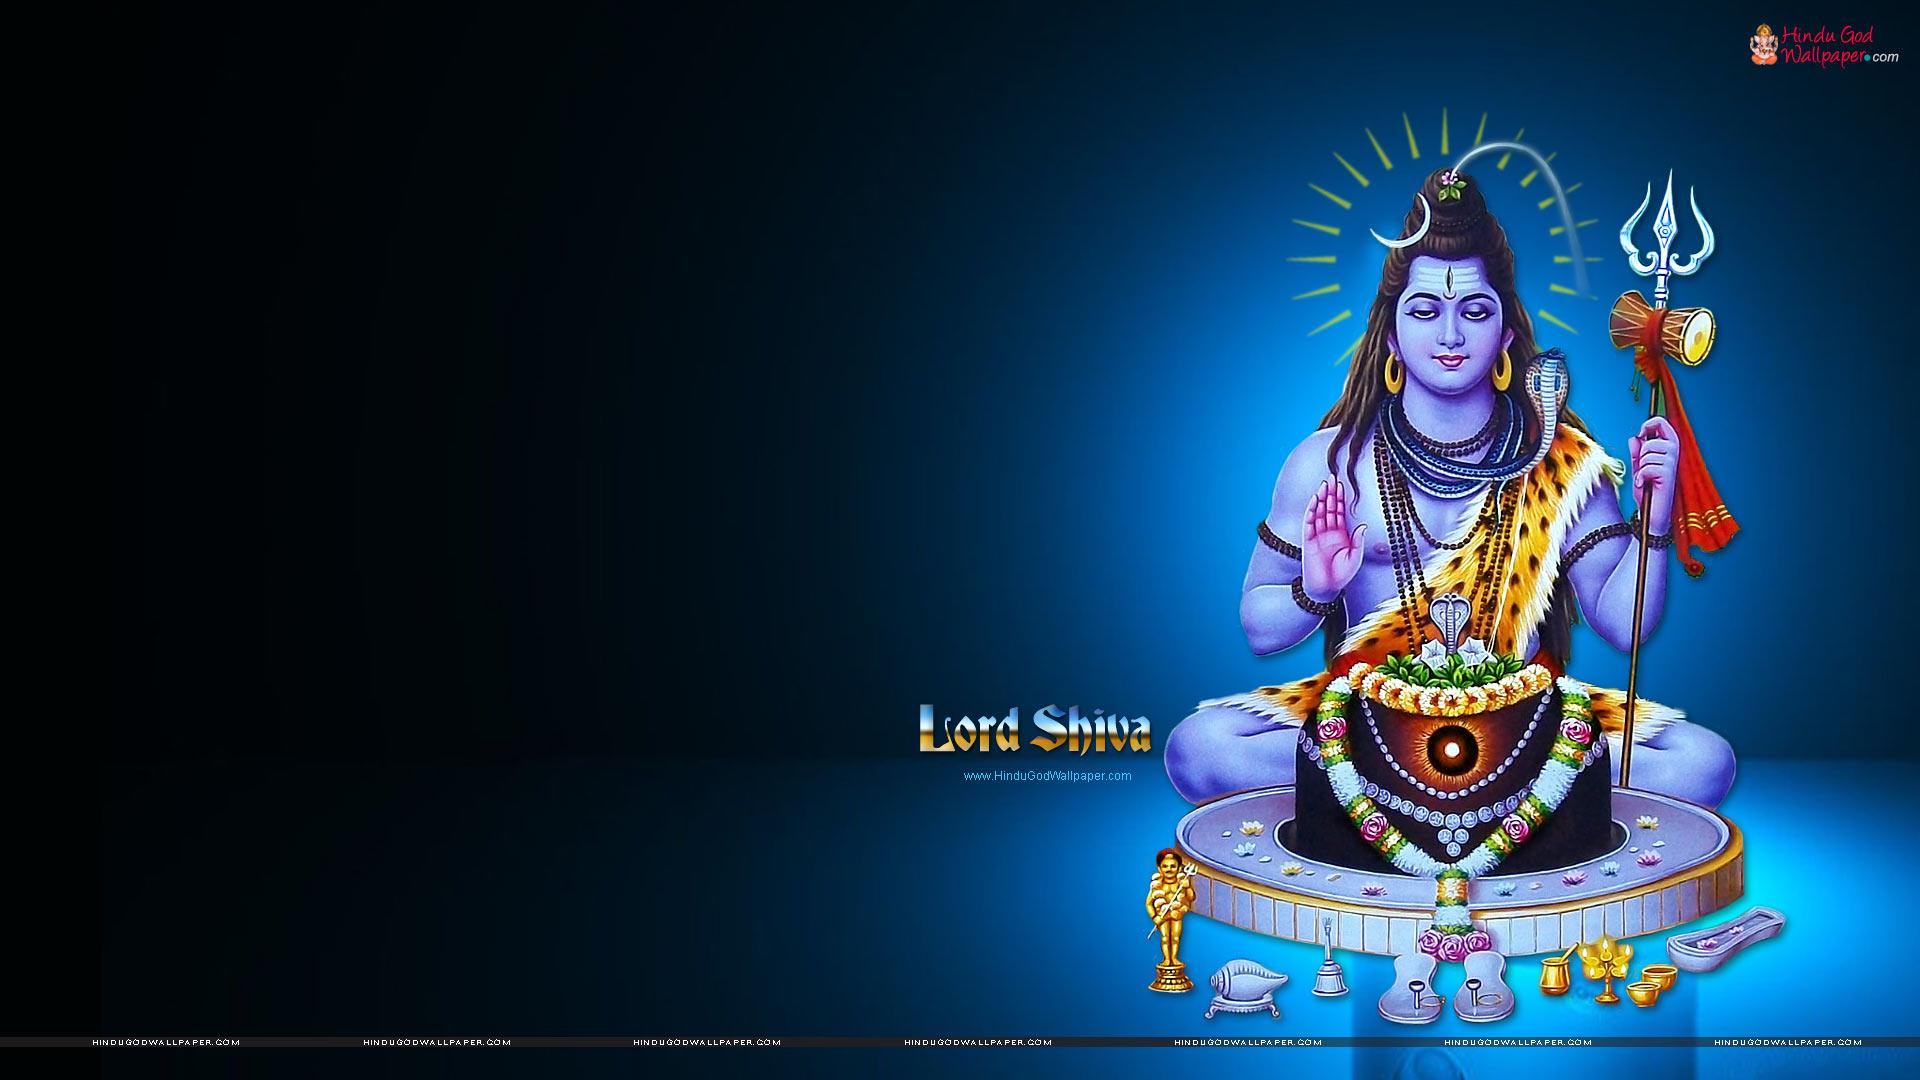 hd wallpapers 1080p of lord krishna